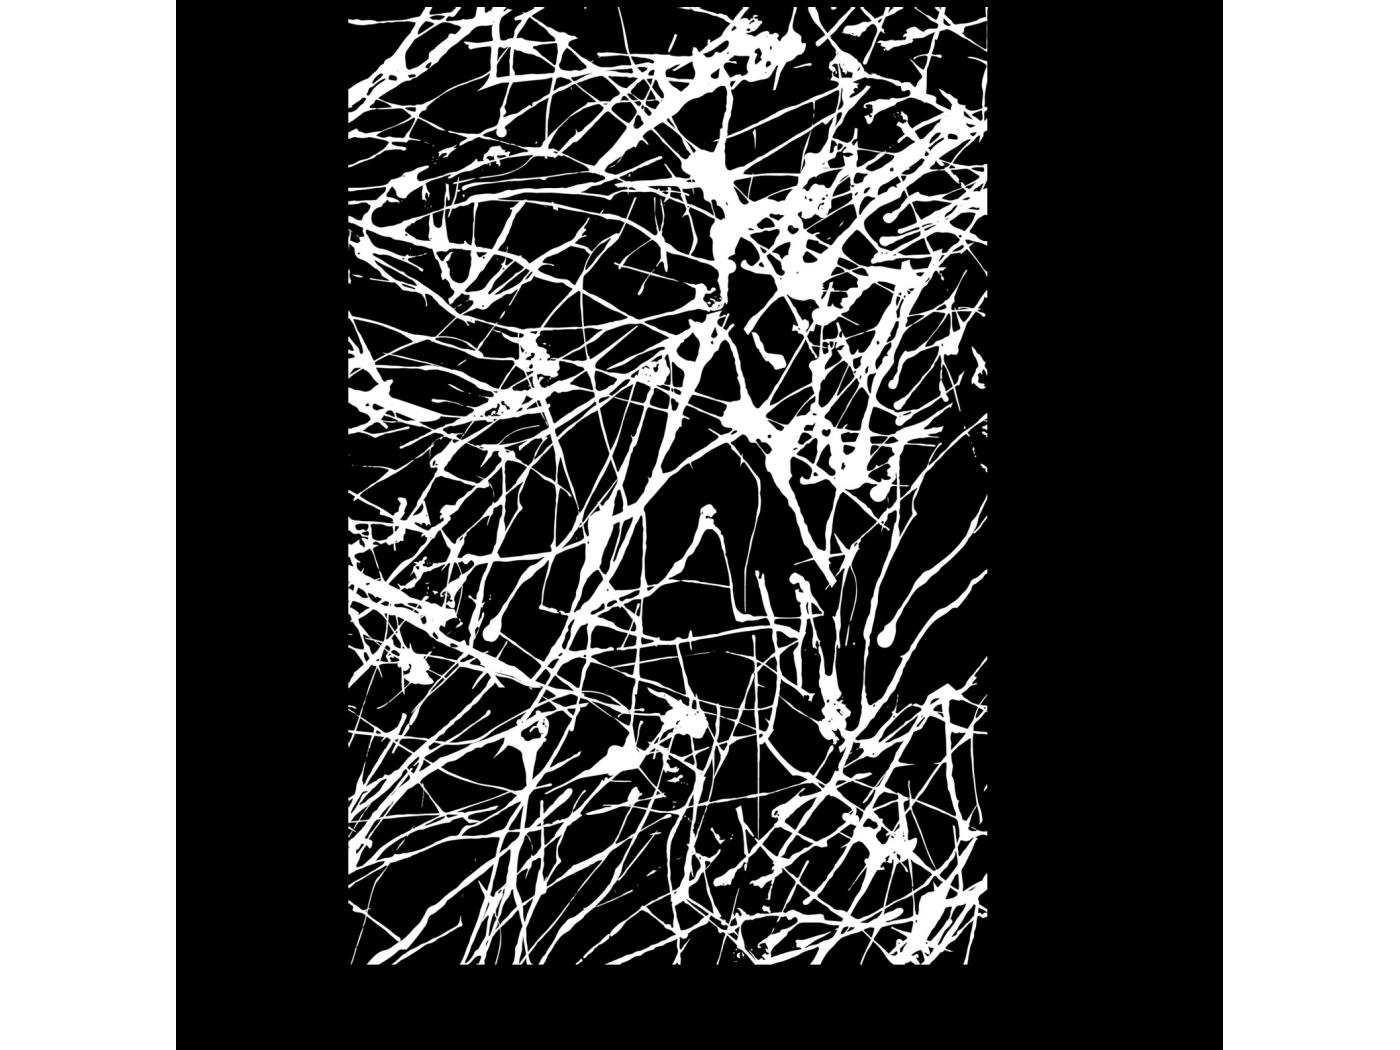 Модульная картина Паутина (20x30) фото